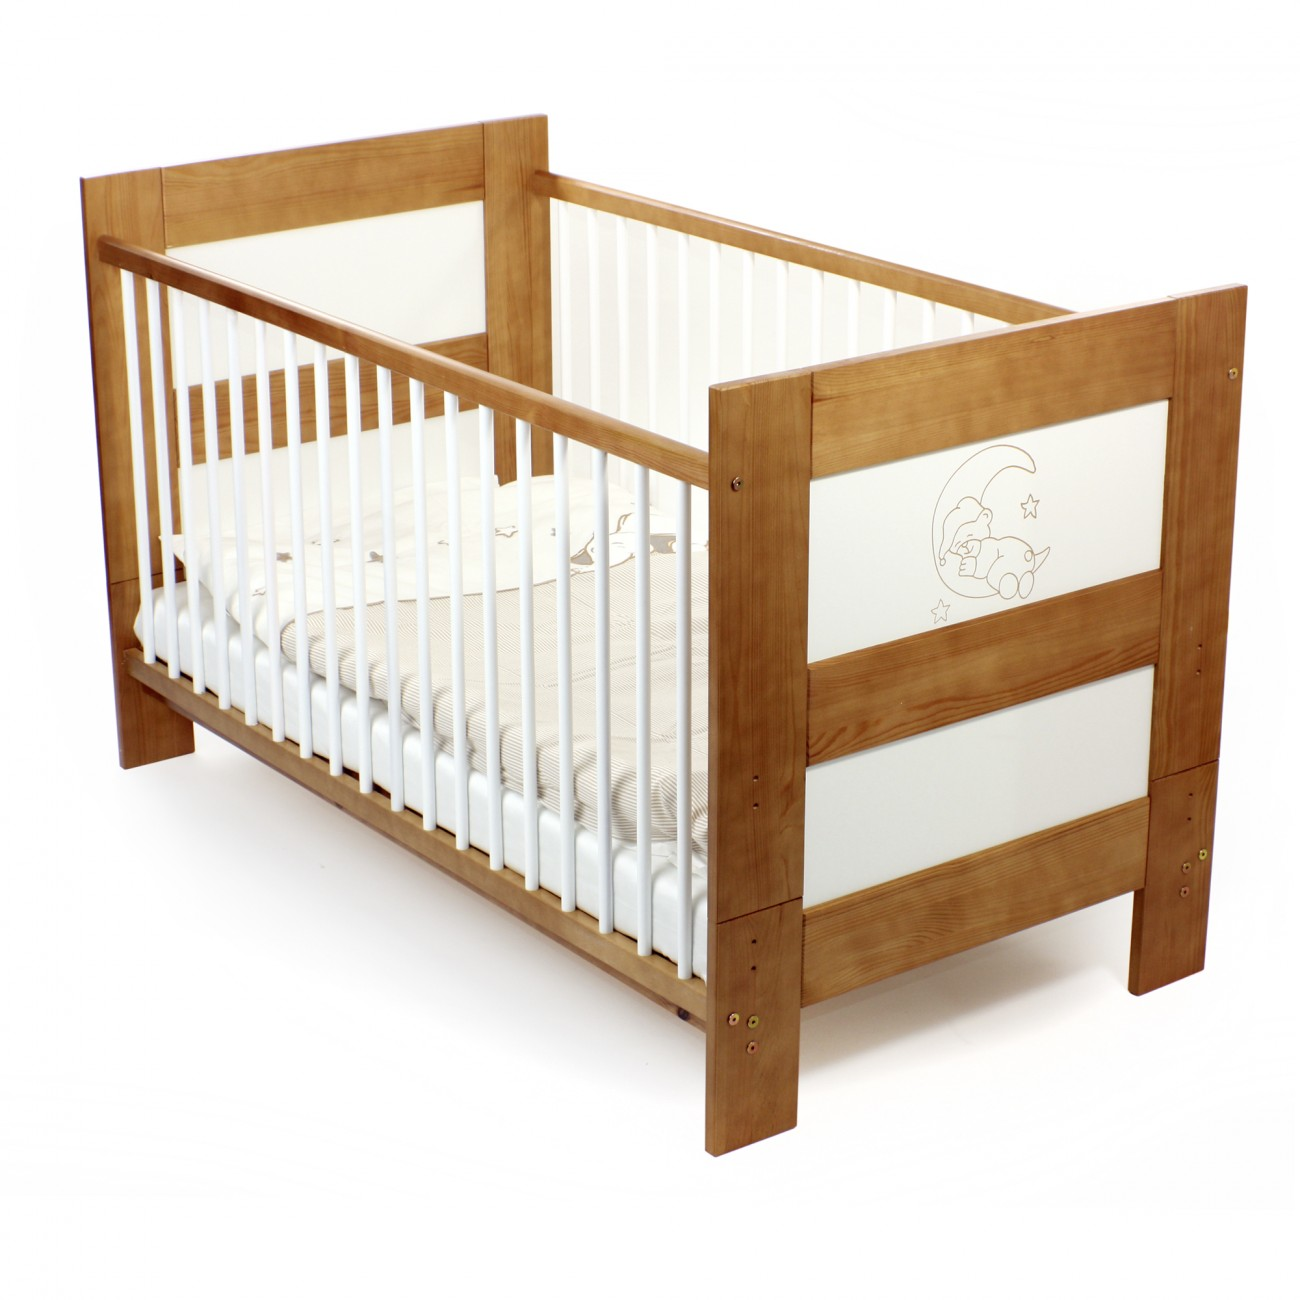 baby vivo kinderbett juniorbett 140 x 70 cm teddy baby kind kinderm bel kinderbetten. Black Bedroom Furniture Sets. Home Design Ideas